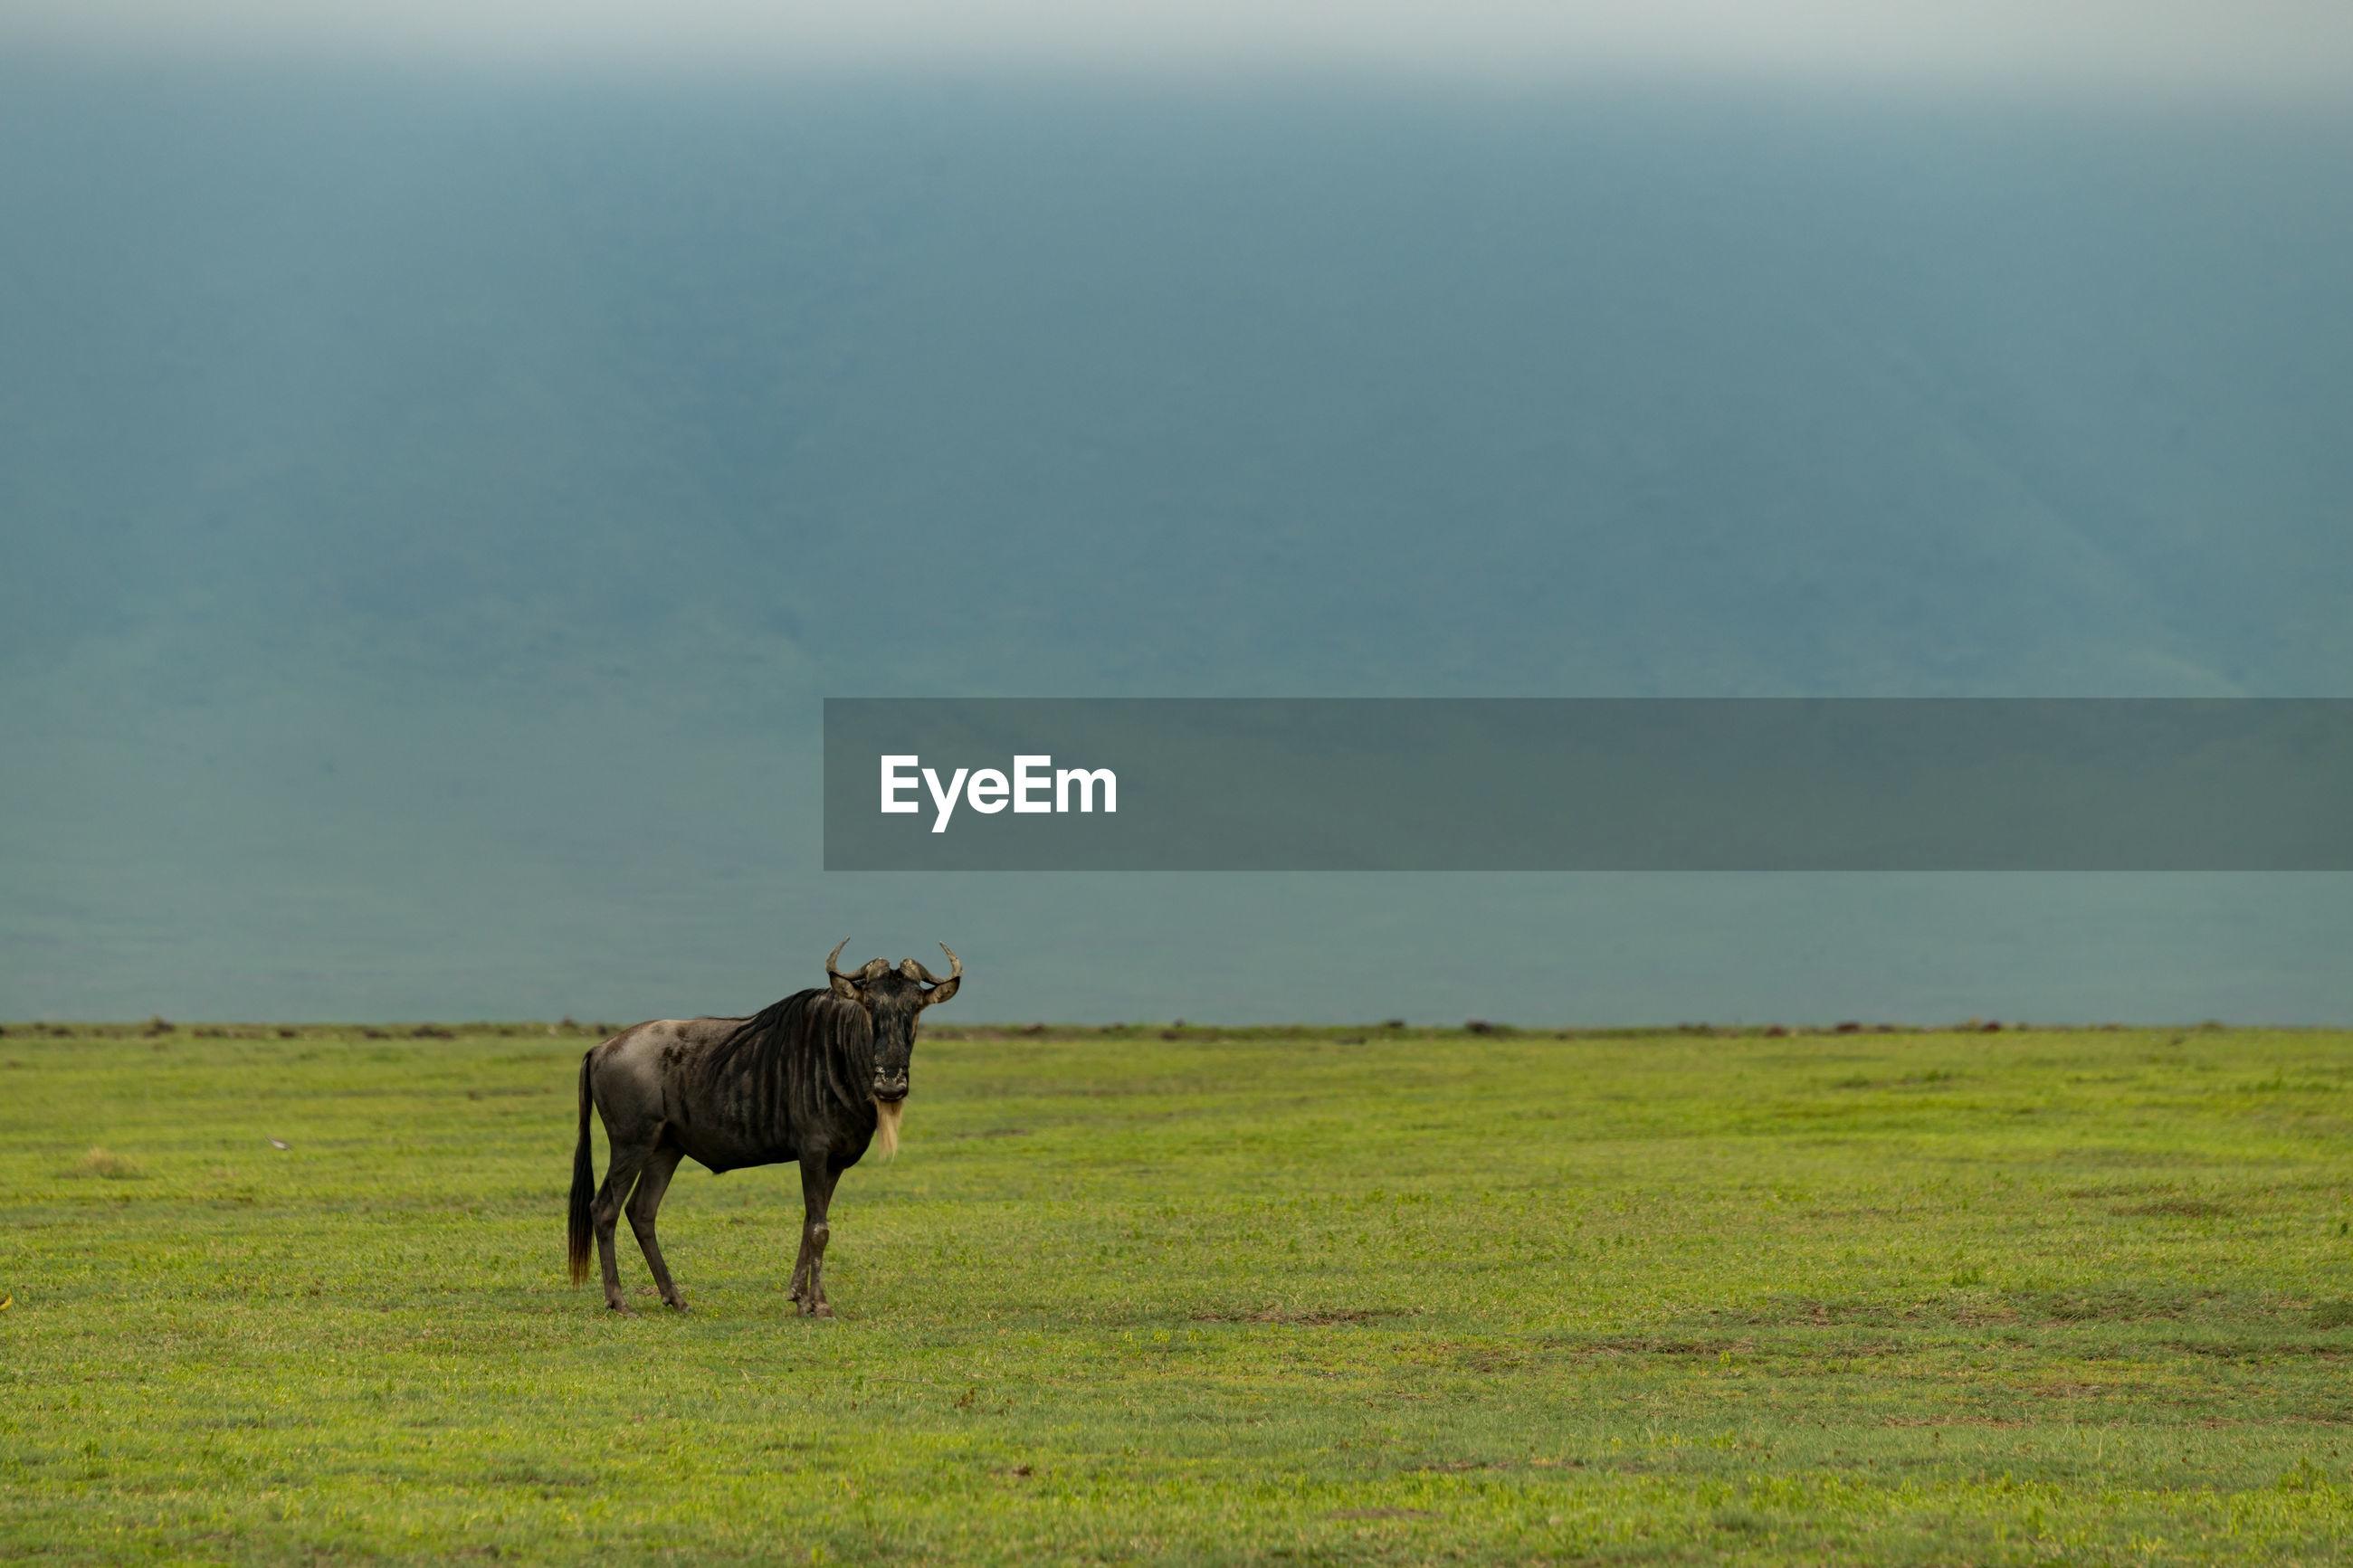 Wildebeest standing on grassy field against sky